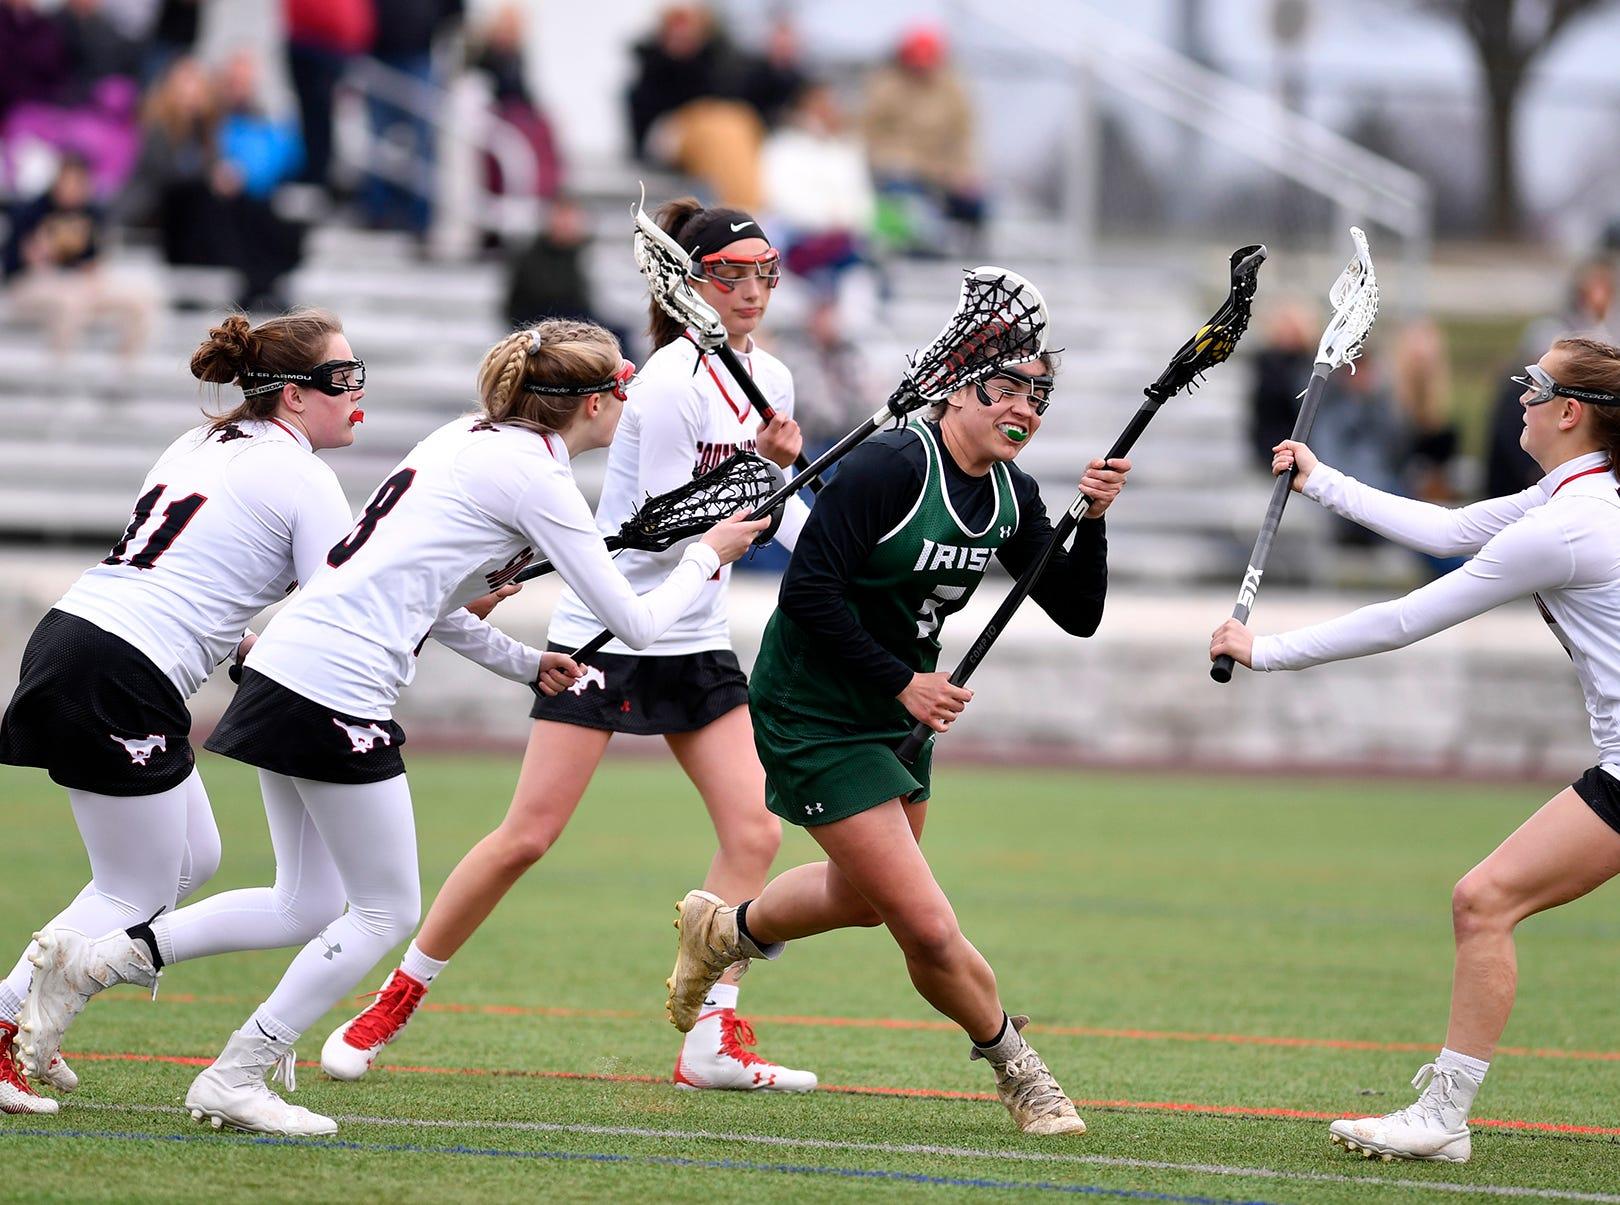 York Catholic at South Western girls' lacrosse, Tuesday, April 2, 2019.John A. Pavoncello photo